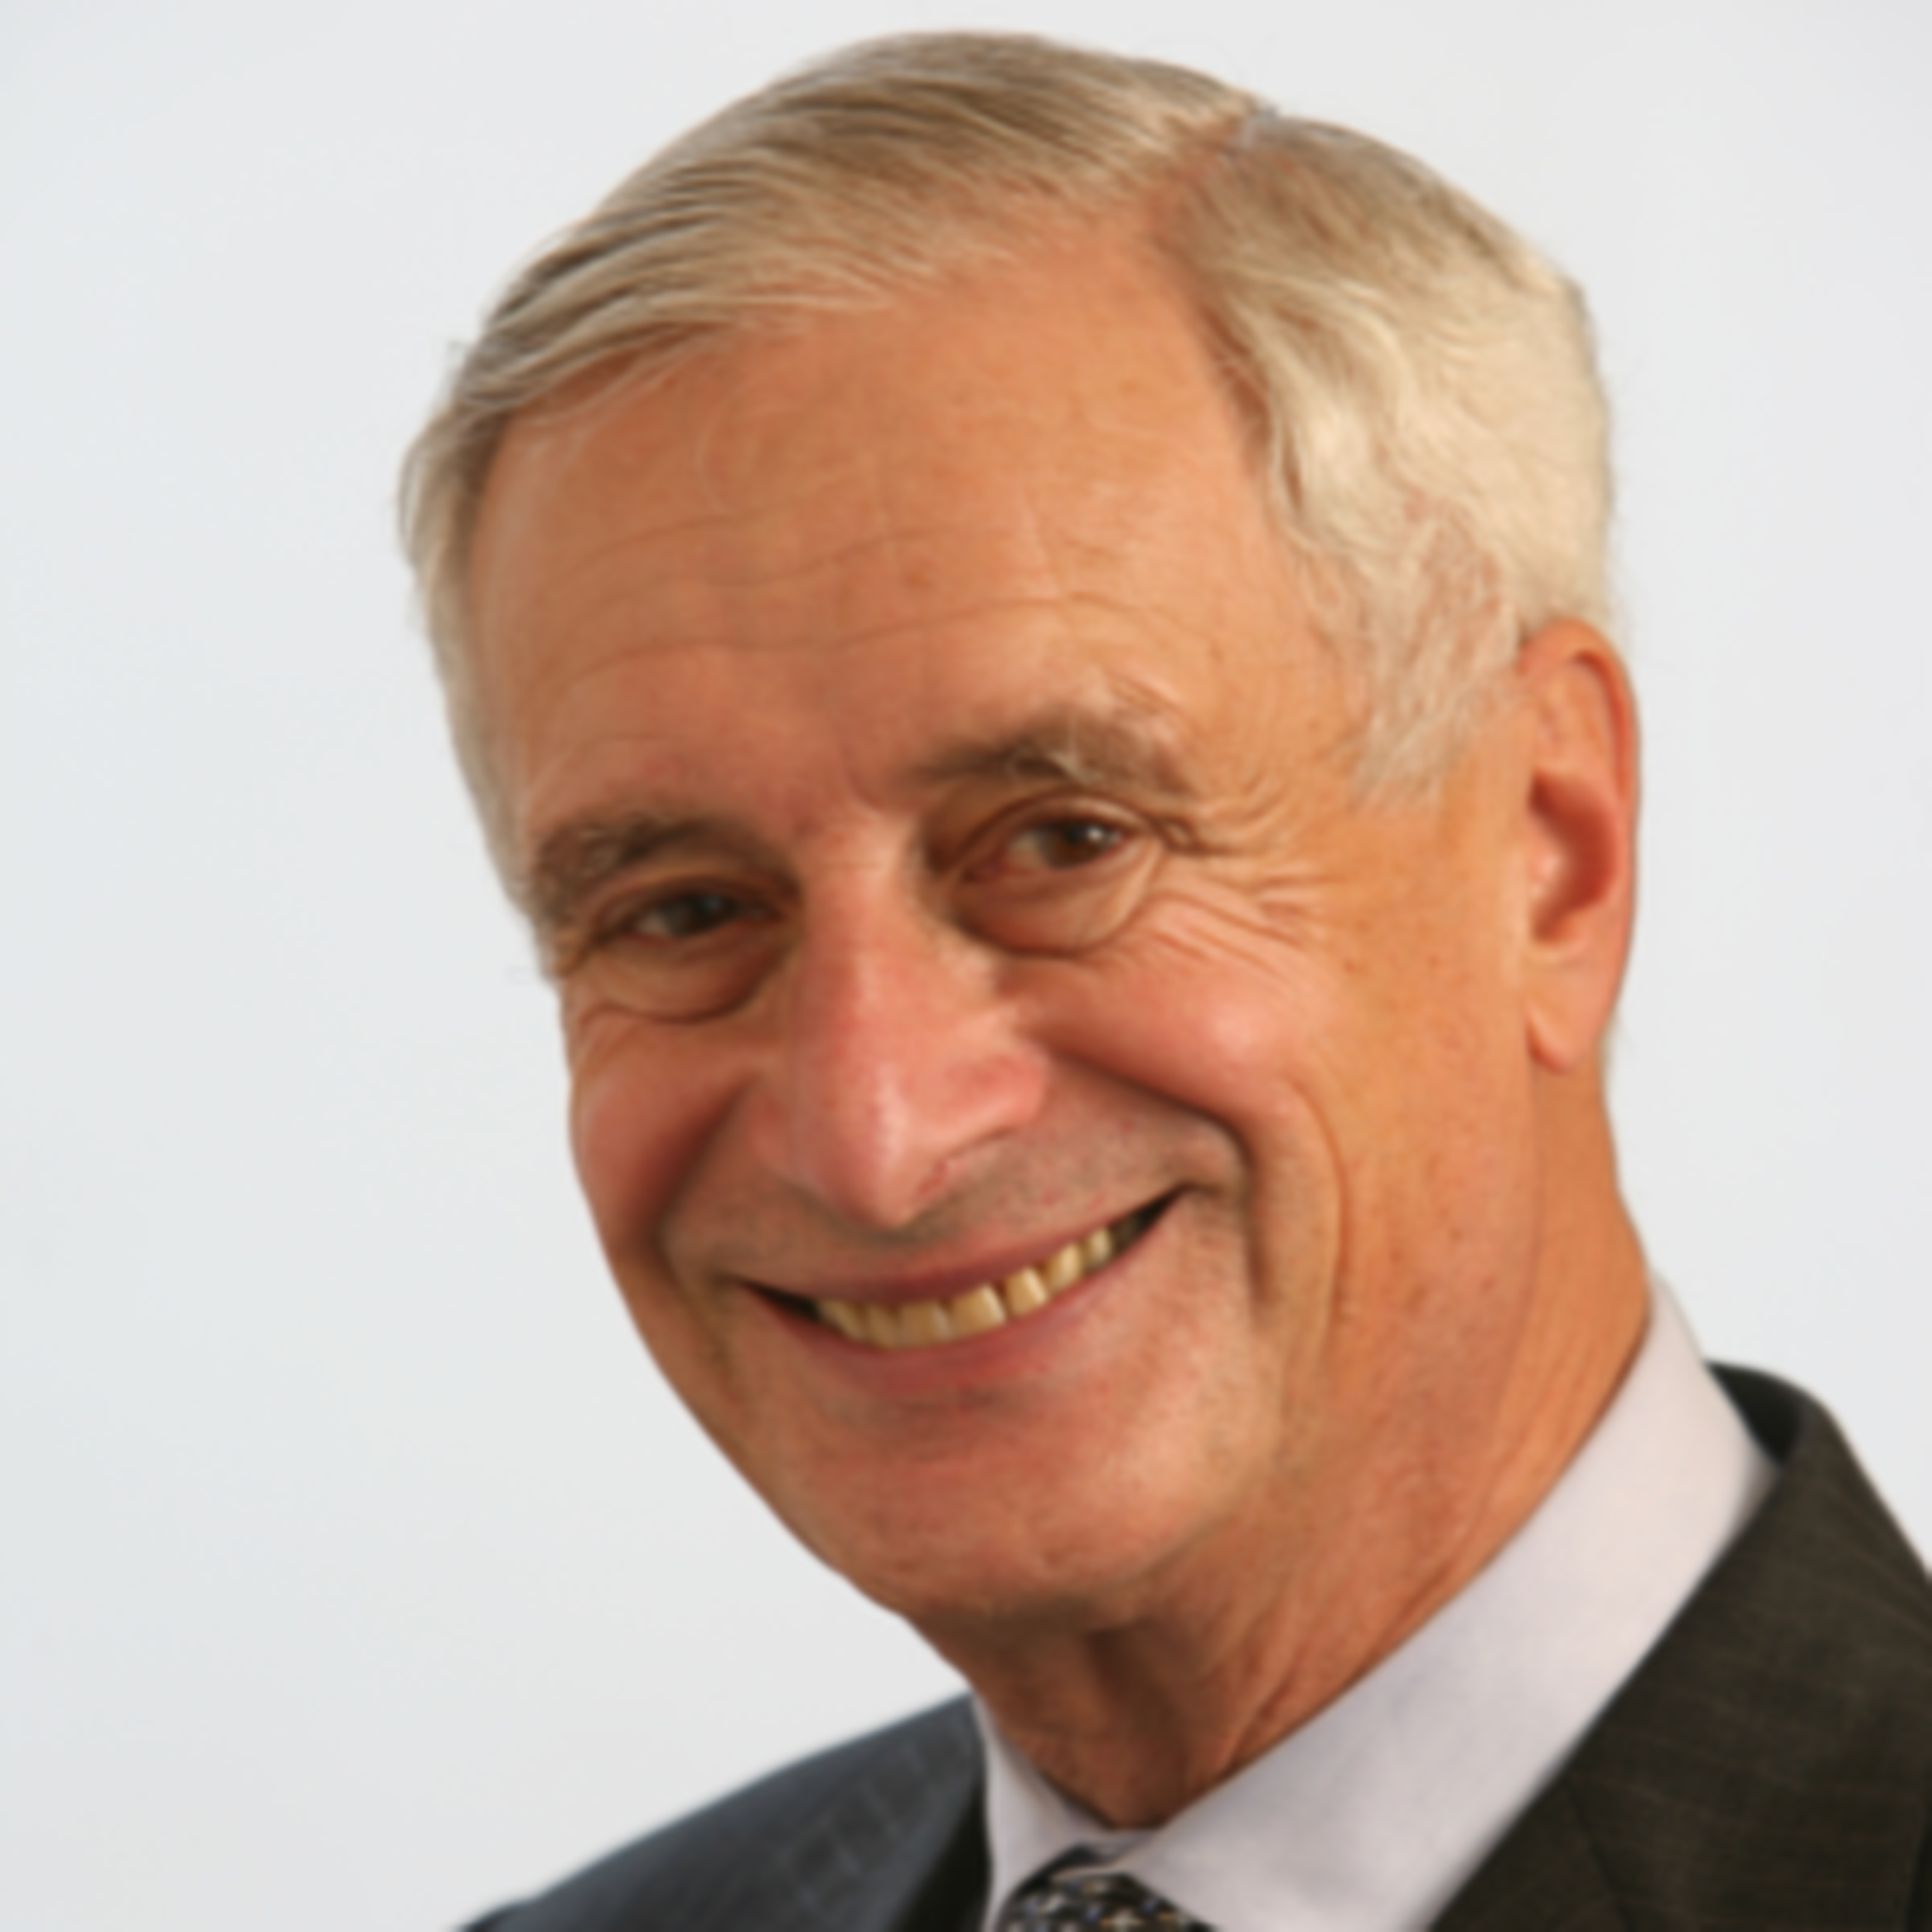 Dr. Robert S. Kaplan